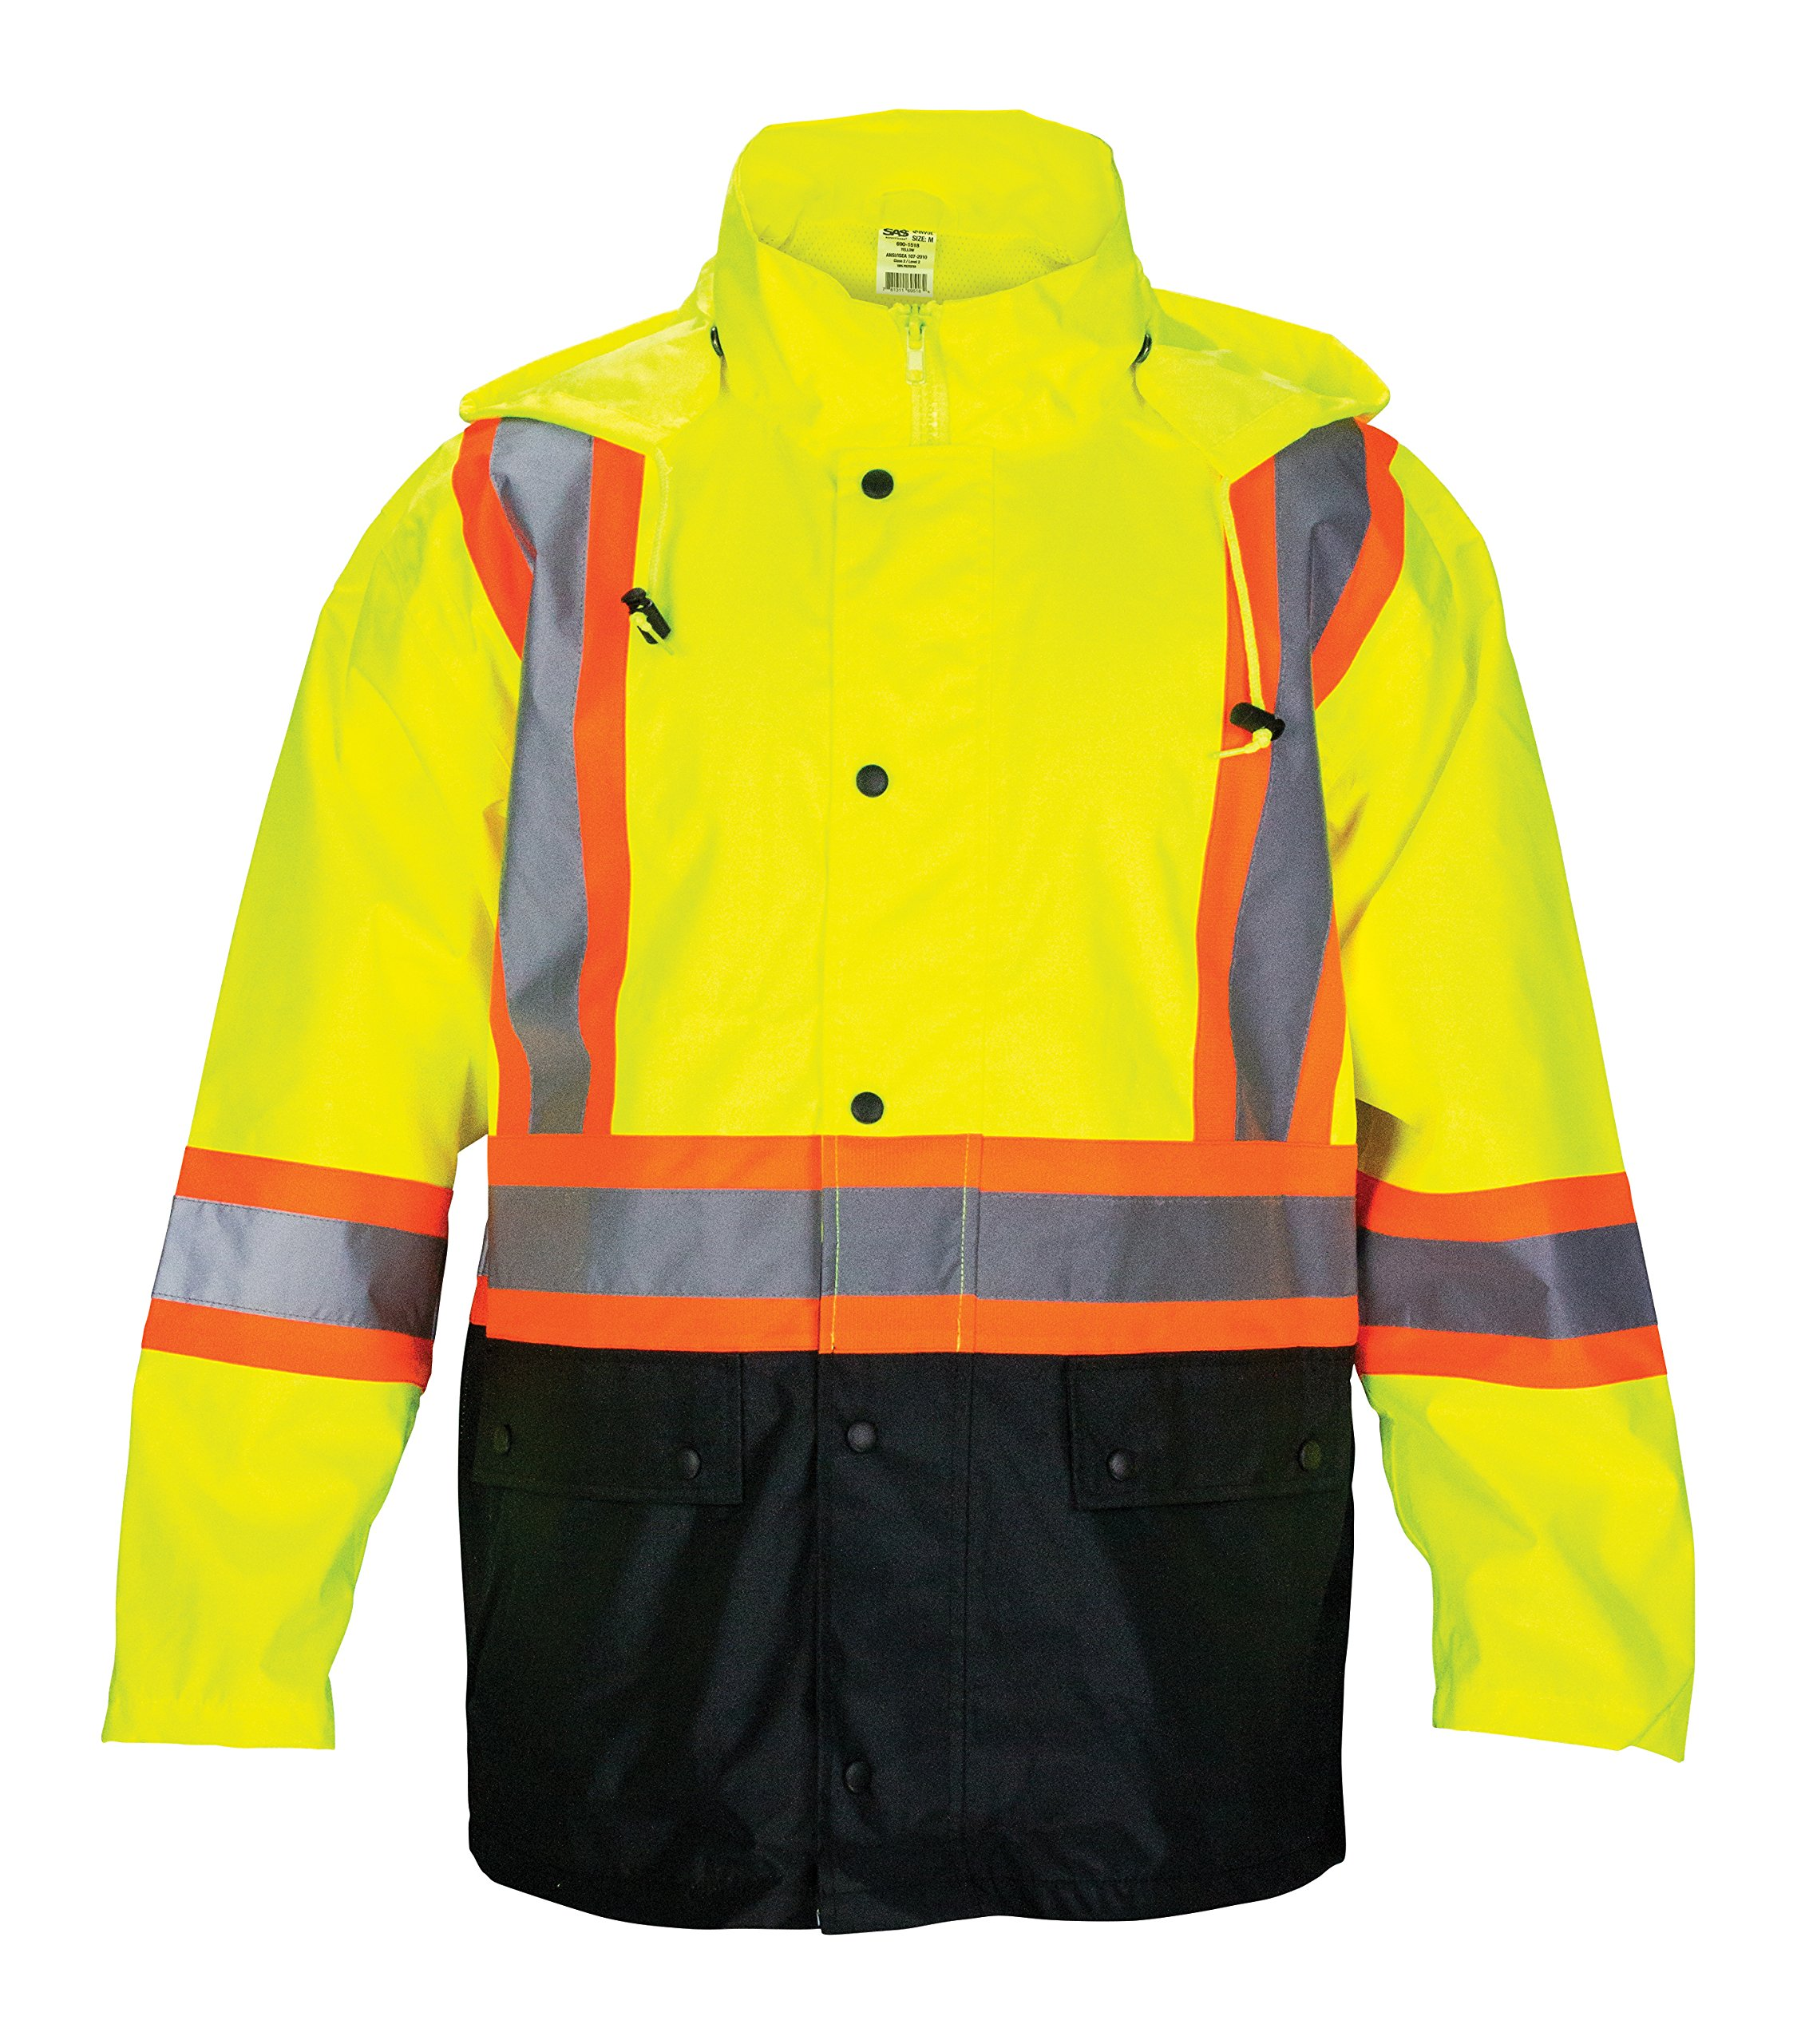 SAS Safety 690-1520 Hi-Viz Class-2 Rain Jacket with Contrast Trim, X-Large, Yellow